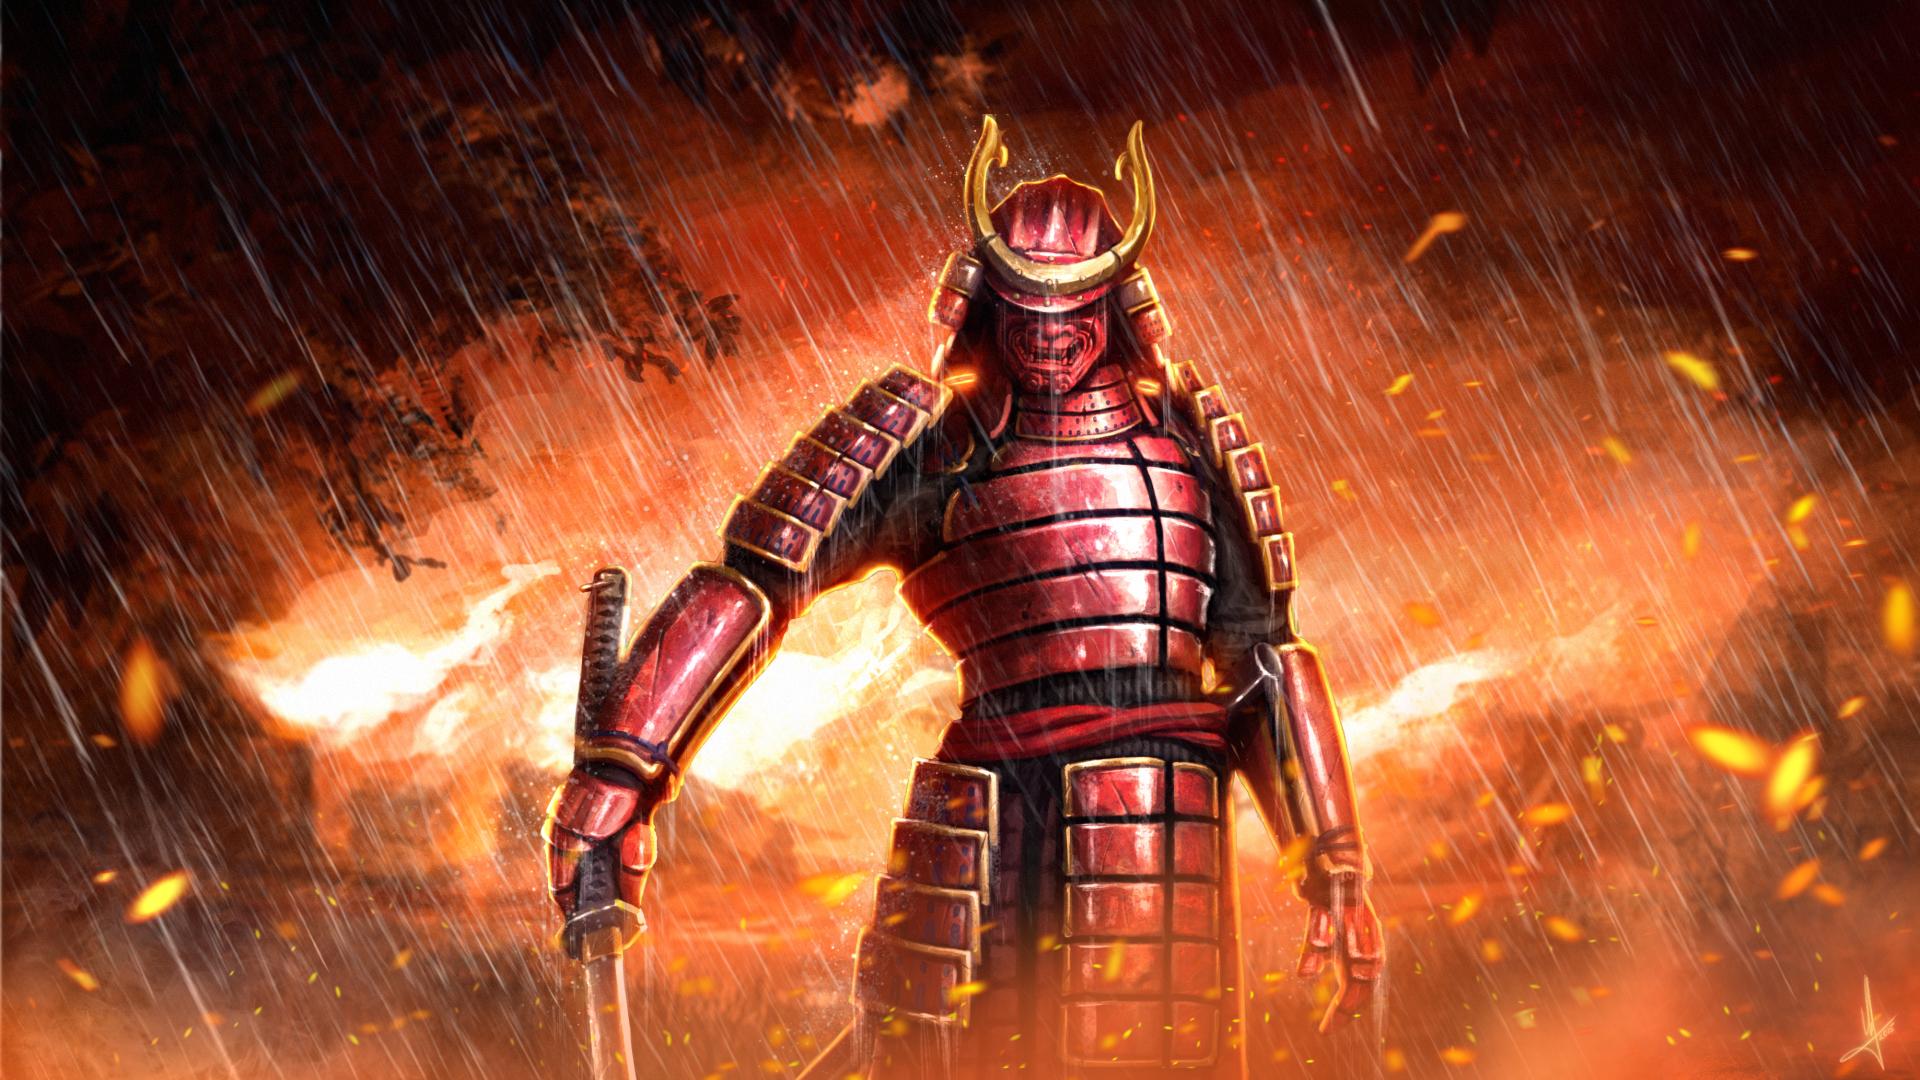 Fantasy - Samurai  Fire Sword Katana Armor Mask Rain Wallpaper